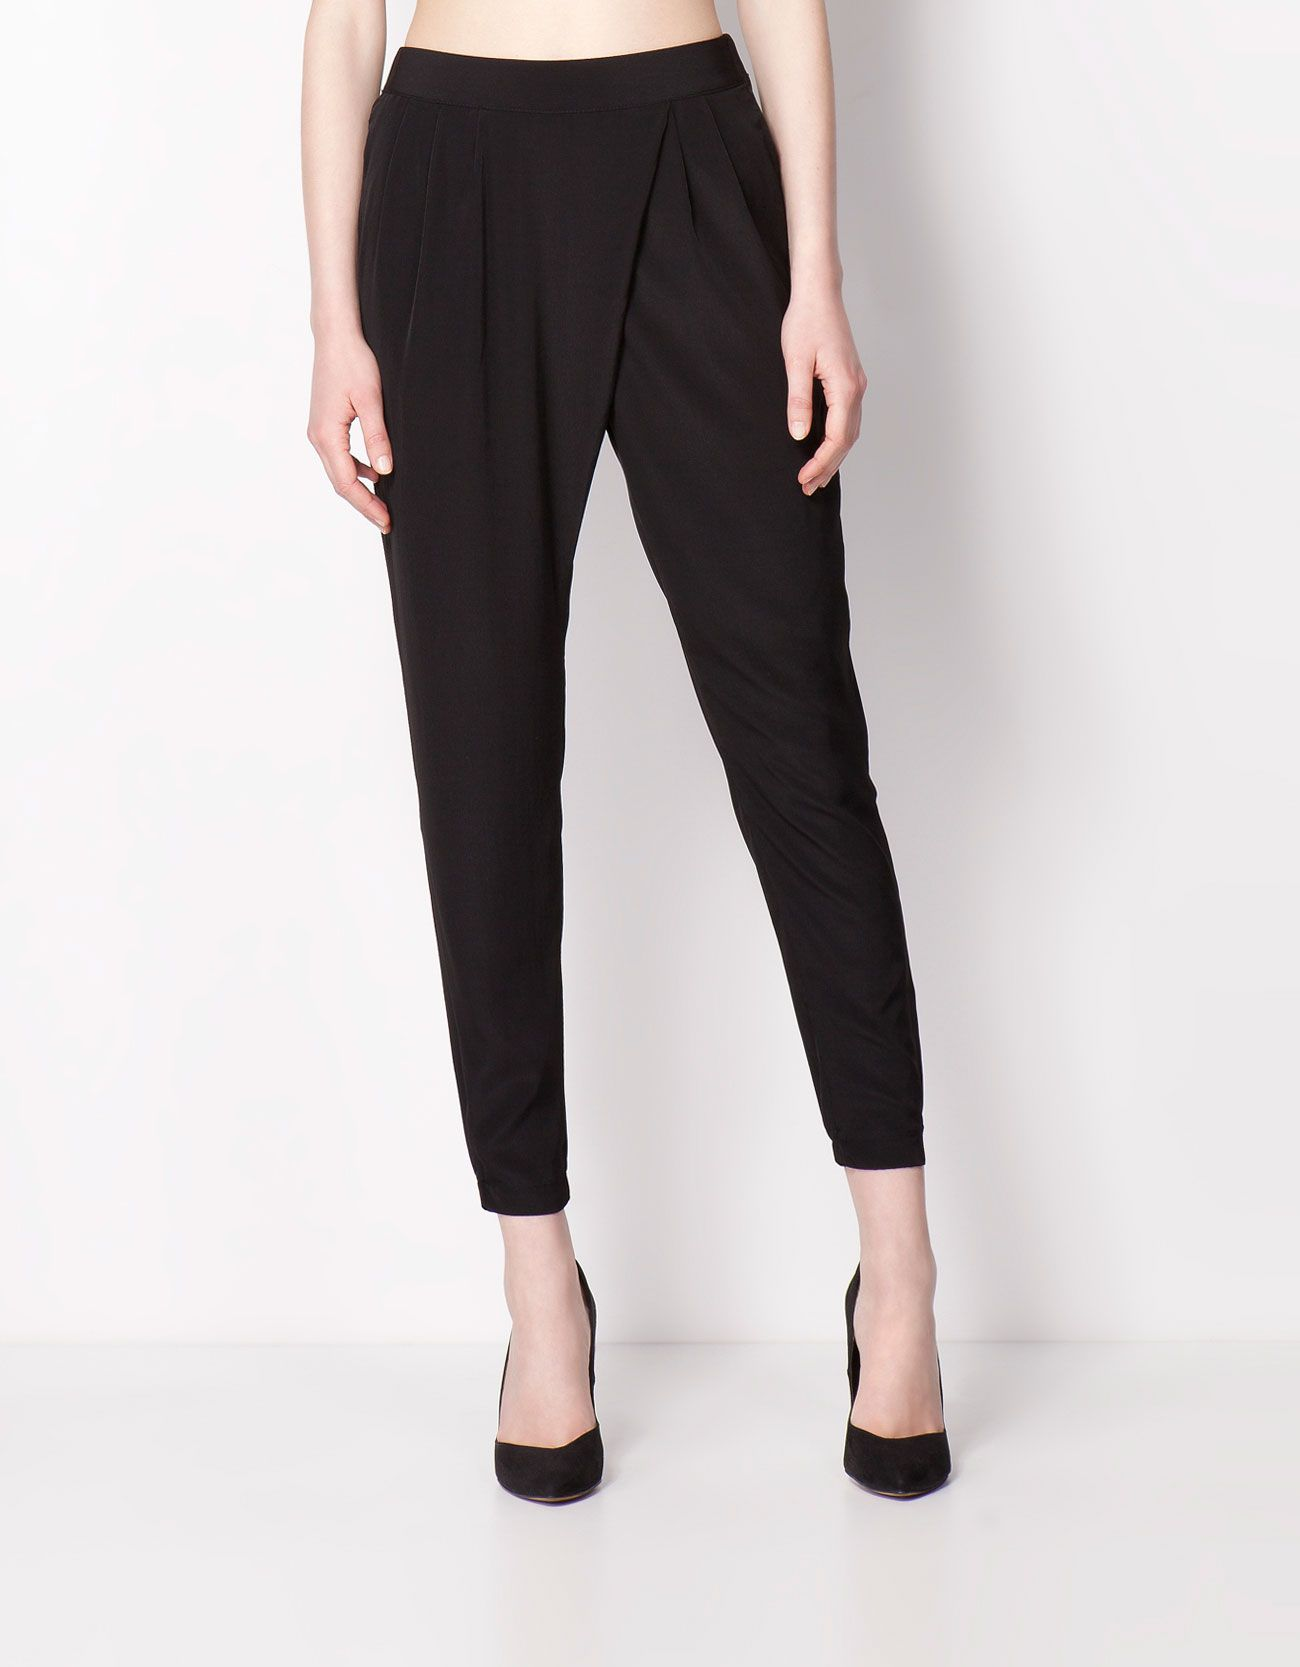 envío gratis d5c94 b0977 Pantalon baggy (Bershka) | pantalones | Baggy trousers ...